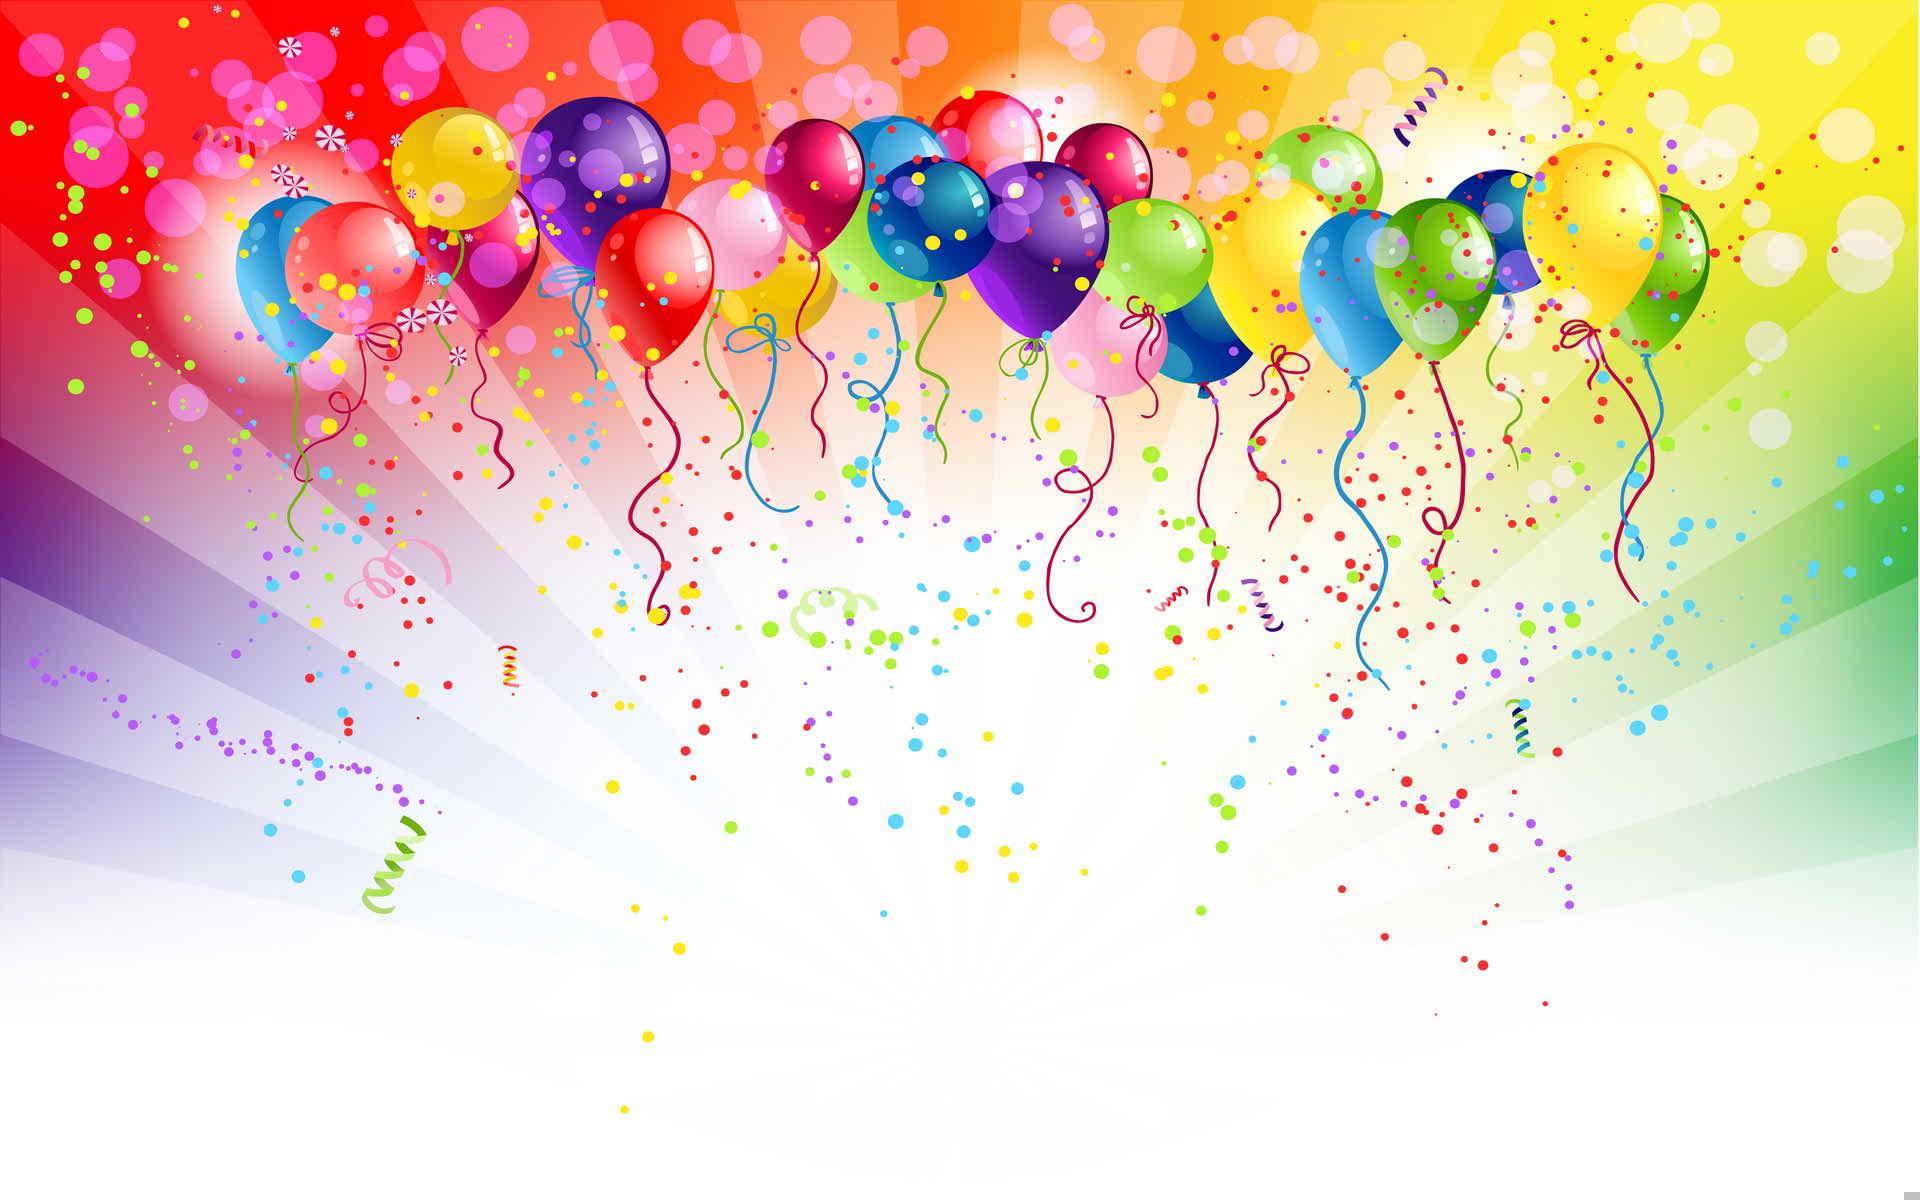 Wallpaper Of Birthday 2336 HDWPro 1920x1200